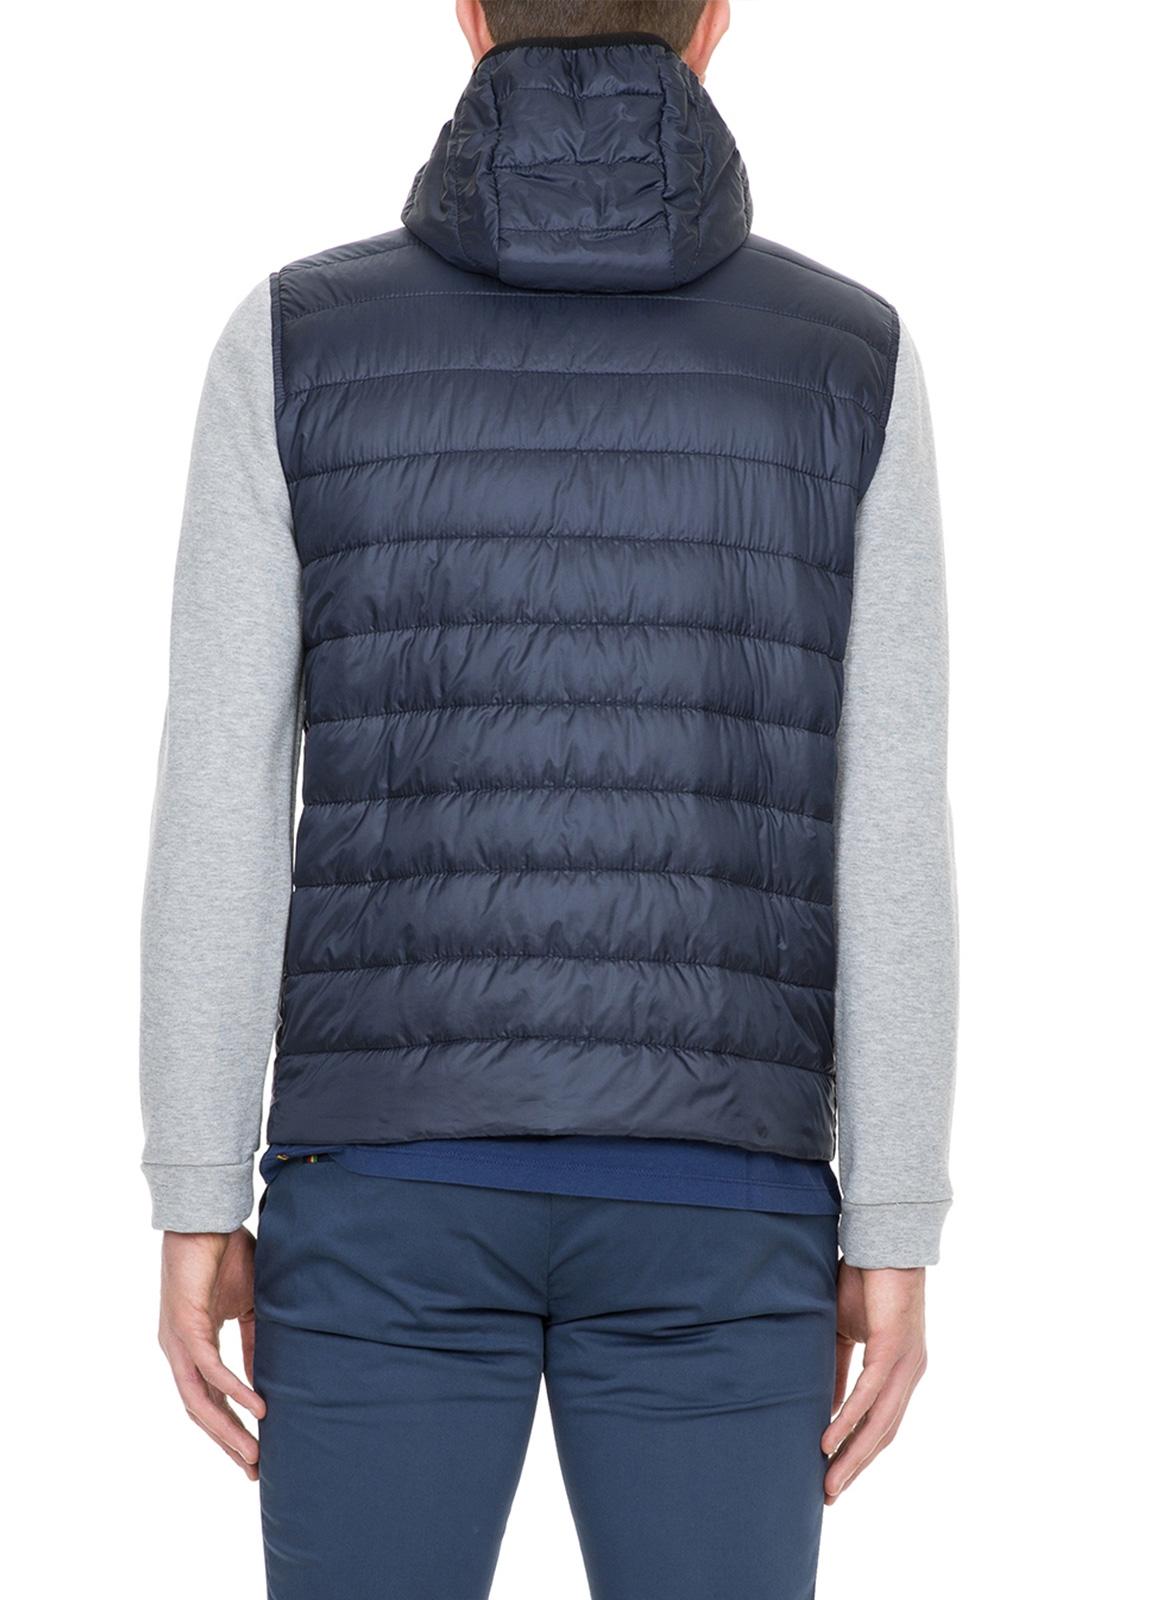 Chaqueta tejido técnico azul marino con mangas de felpa color gris - Ítem2